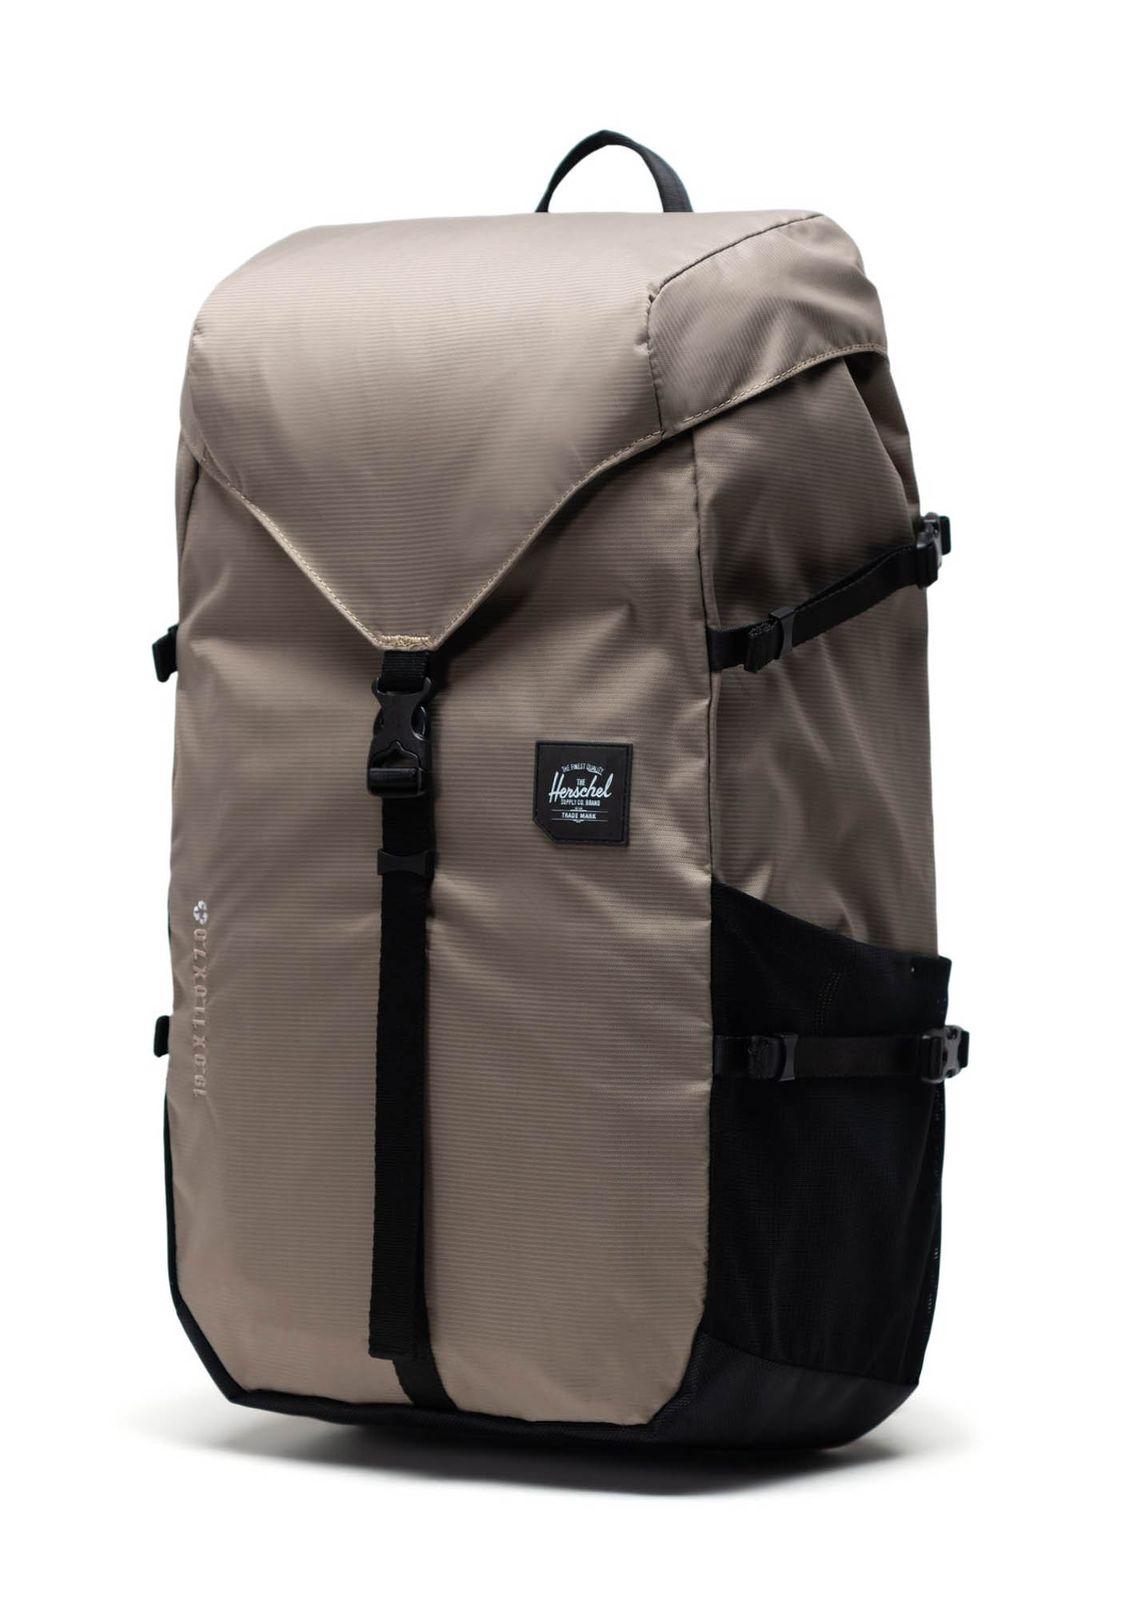 Herschel Barlow Backpack L Timberwolf / Black